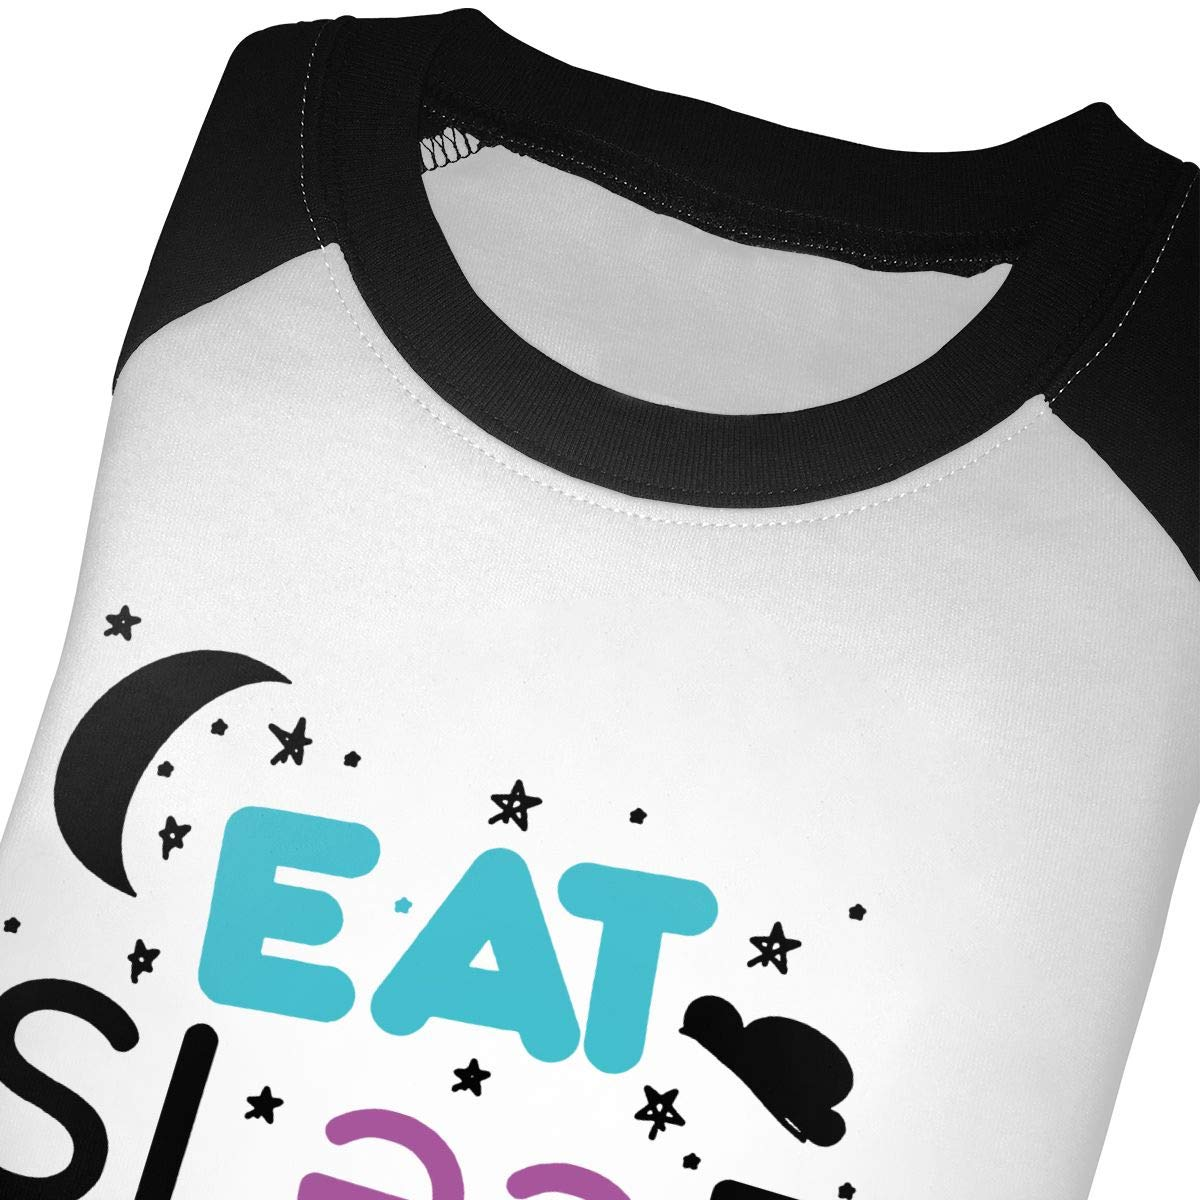 Eat Sleep Rave Repeat Unisex Toddler Baseball Jersey Contrast 3//4 Sleeves Tee